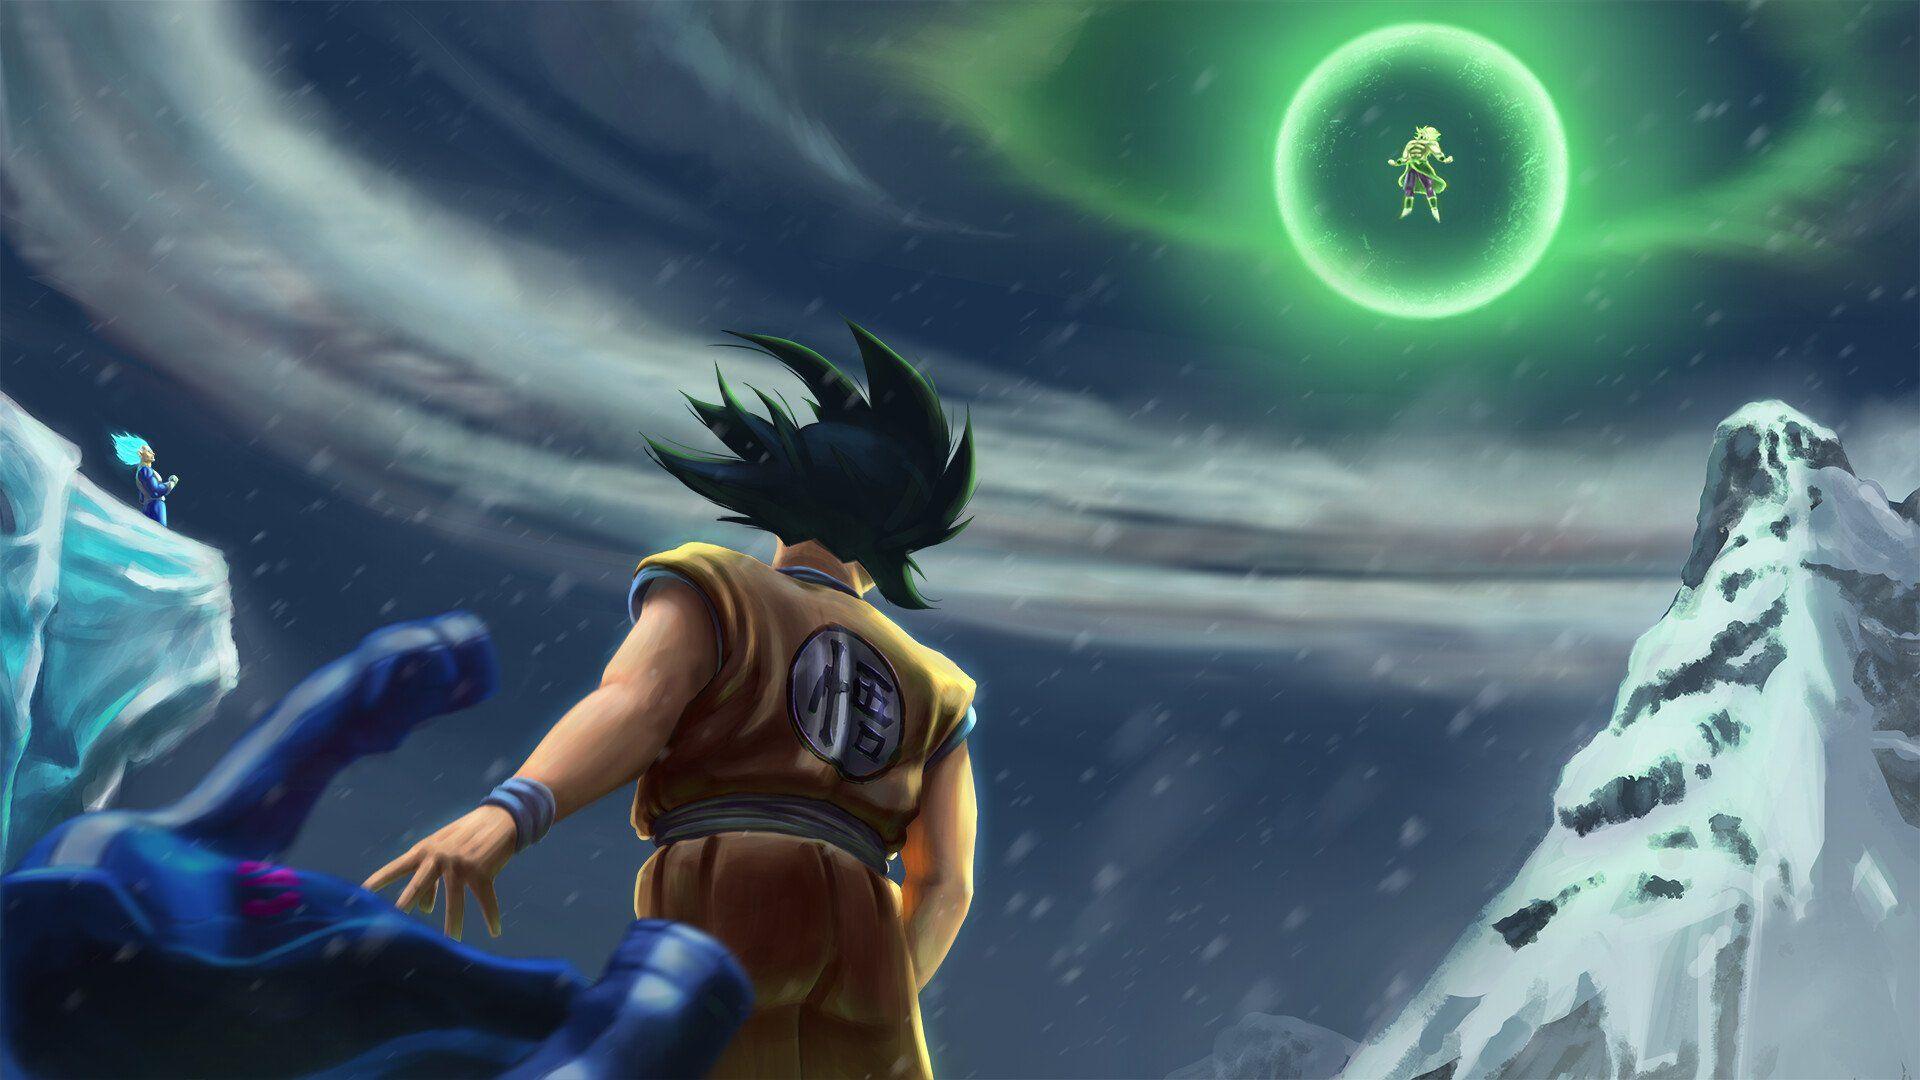 Goku Vegeta Vs Broly Movie Dragon Ball Super Broly Broly Dragon Ball Vegeta Dragon Bal Dragon Ball Wallpapers Goku Wallpaper Dragon Ball Wallpaper Iphone